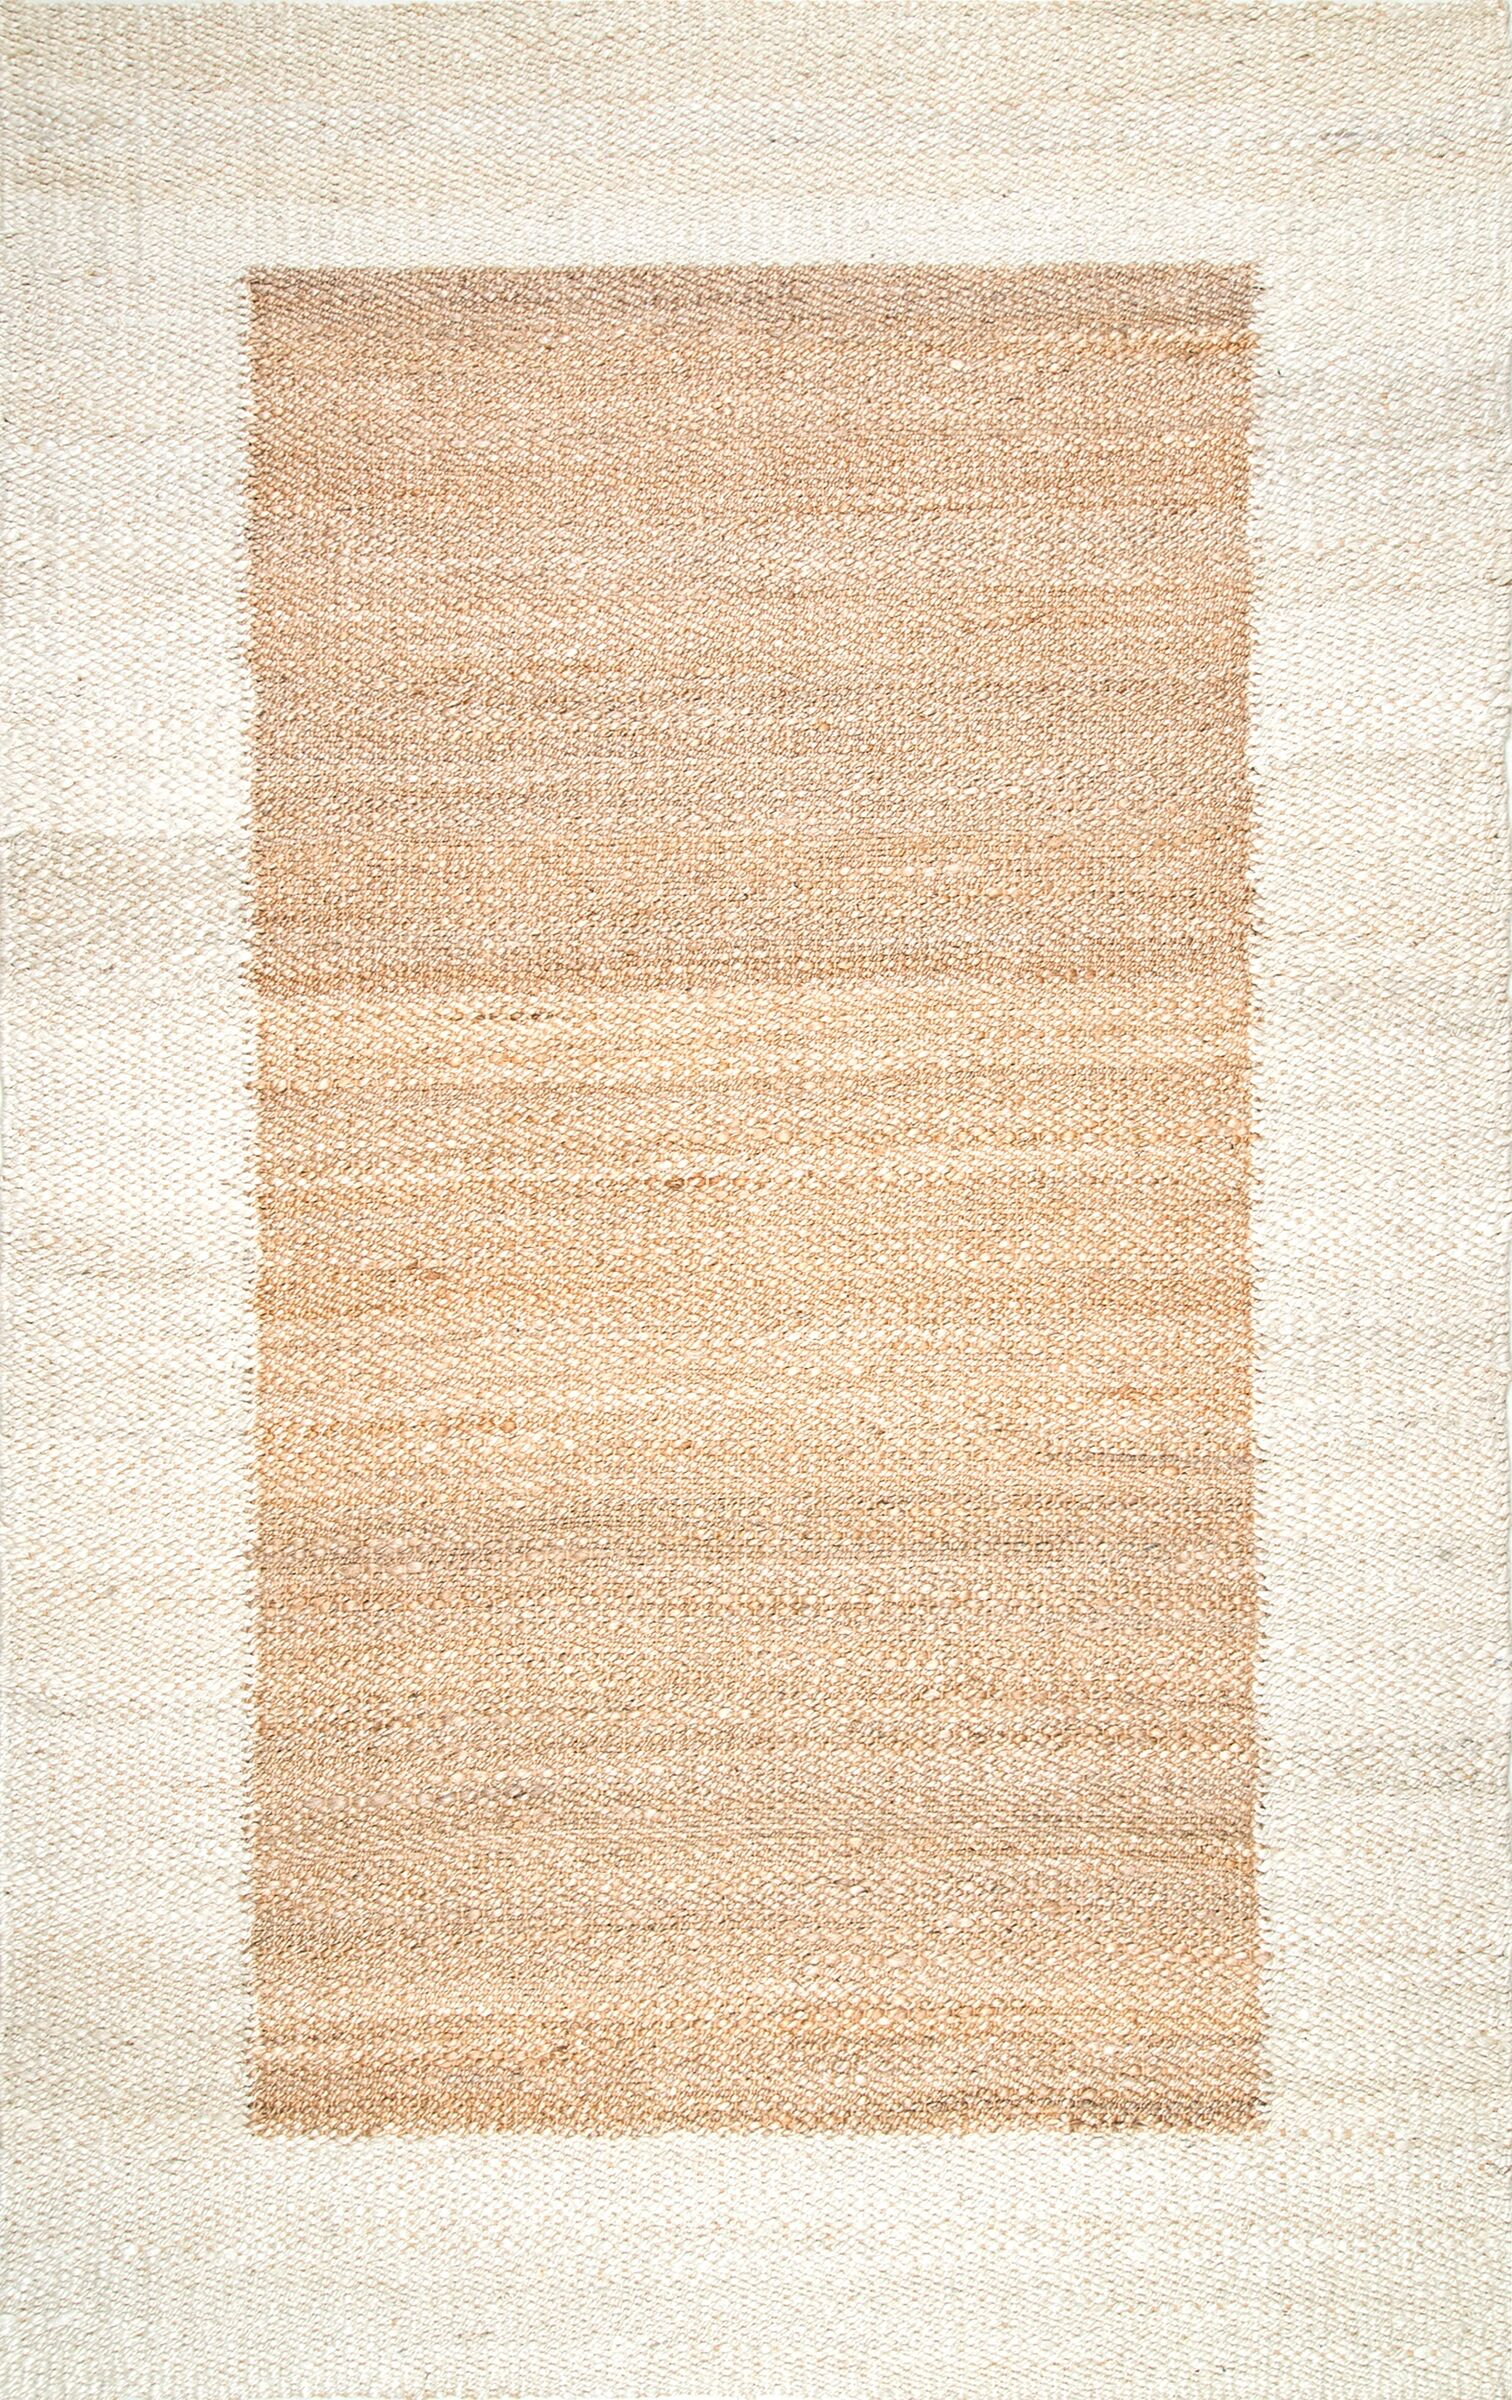 Parthenon Hand Woven Brown Area Rug Rug Size: Rectangle 5' x 8'